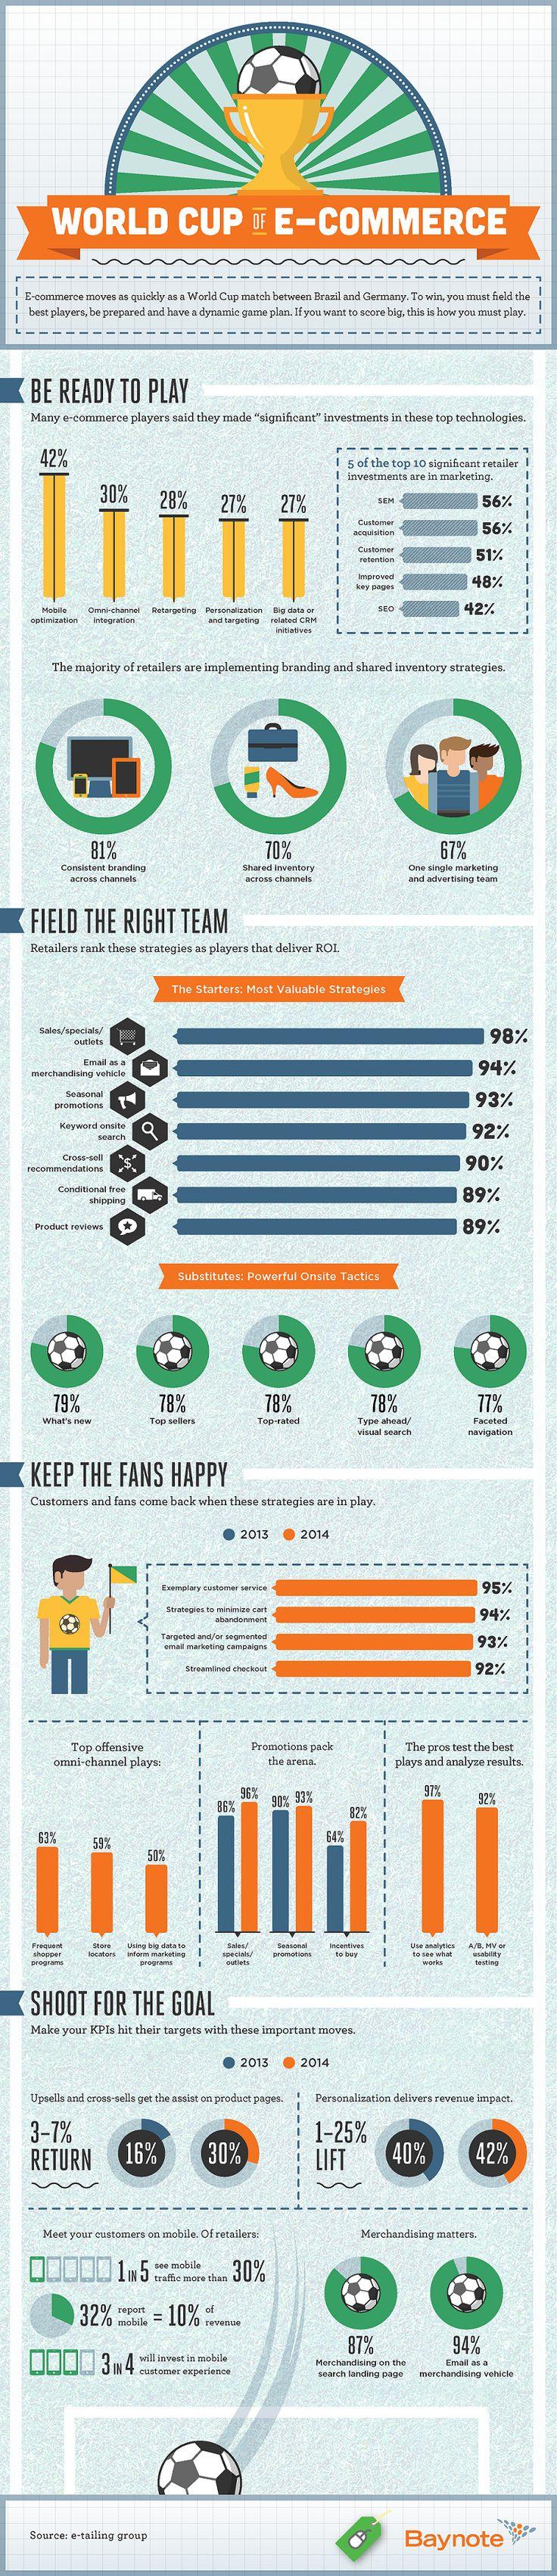 Digital-Marketing-World-cup-of-ecommerce Digital Marketing : World cup of ecommerce